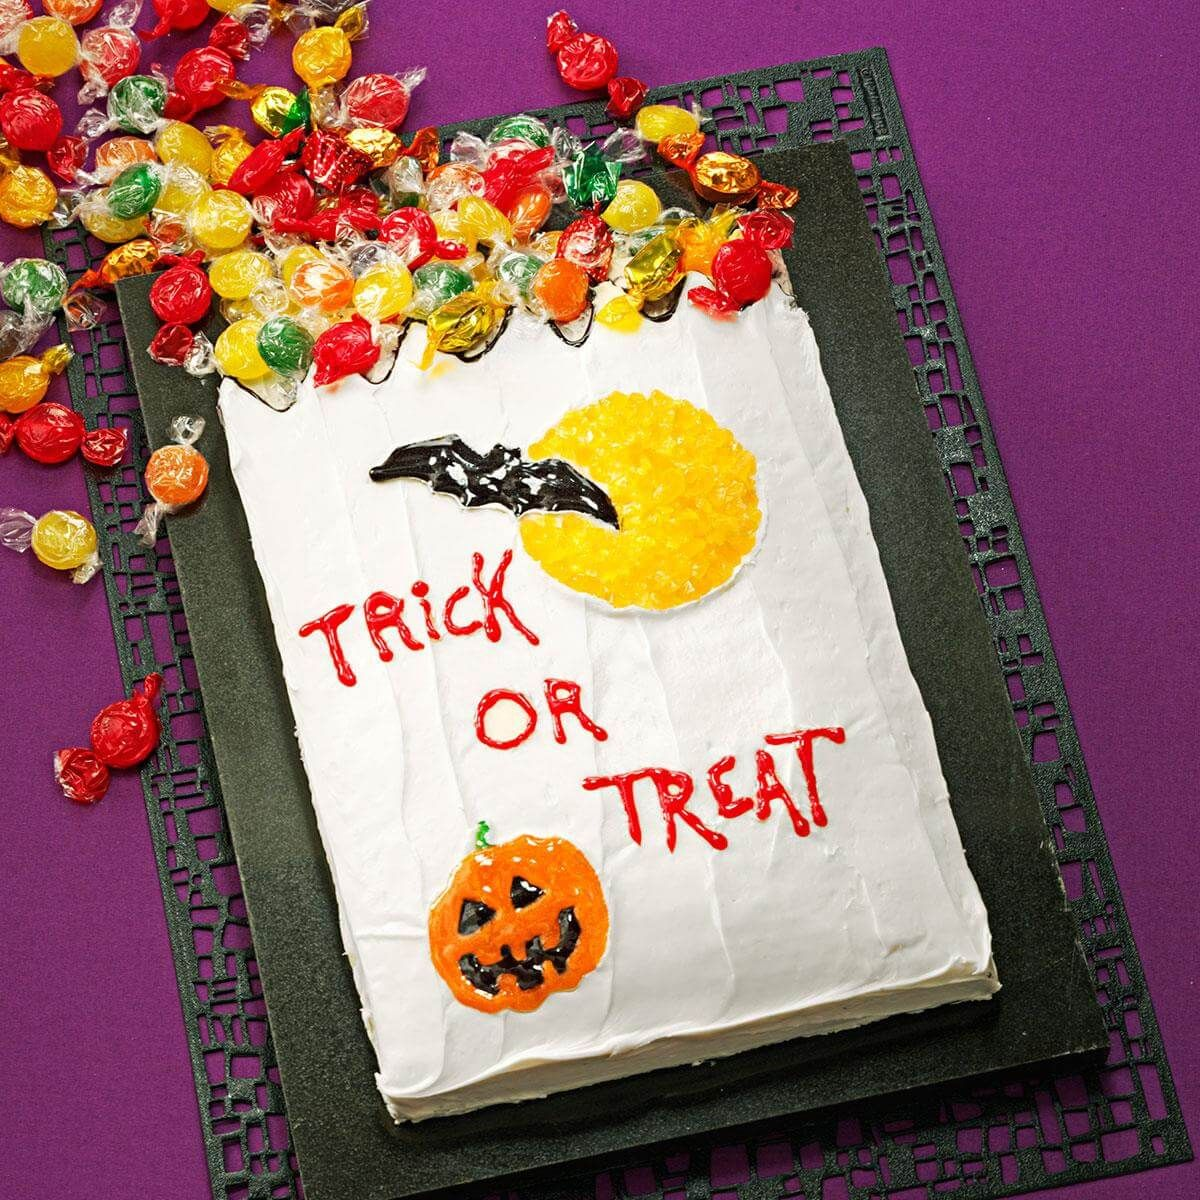 Trickortreat cake recipe halloween cake recipes